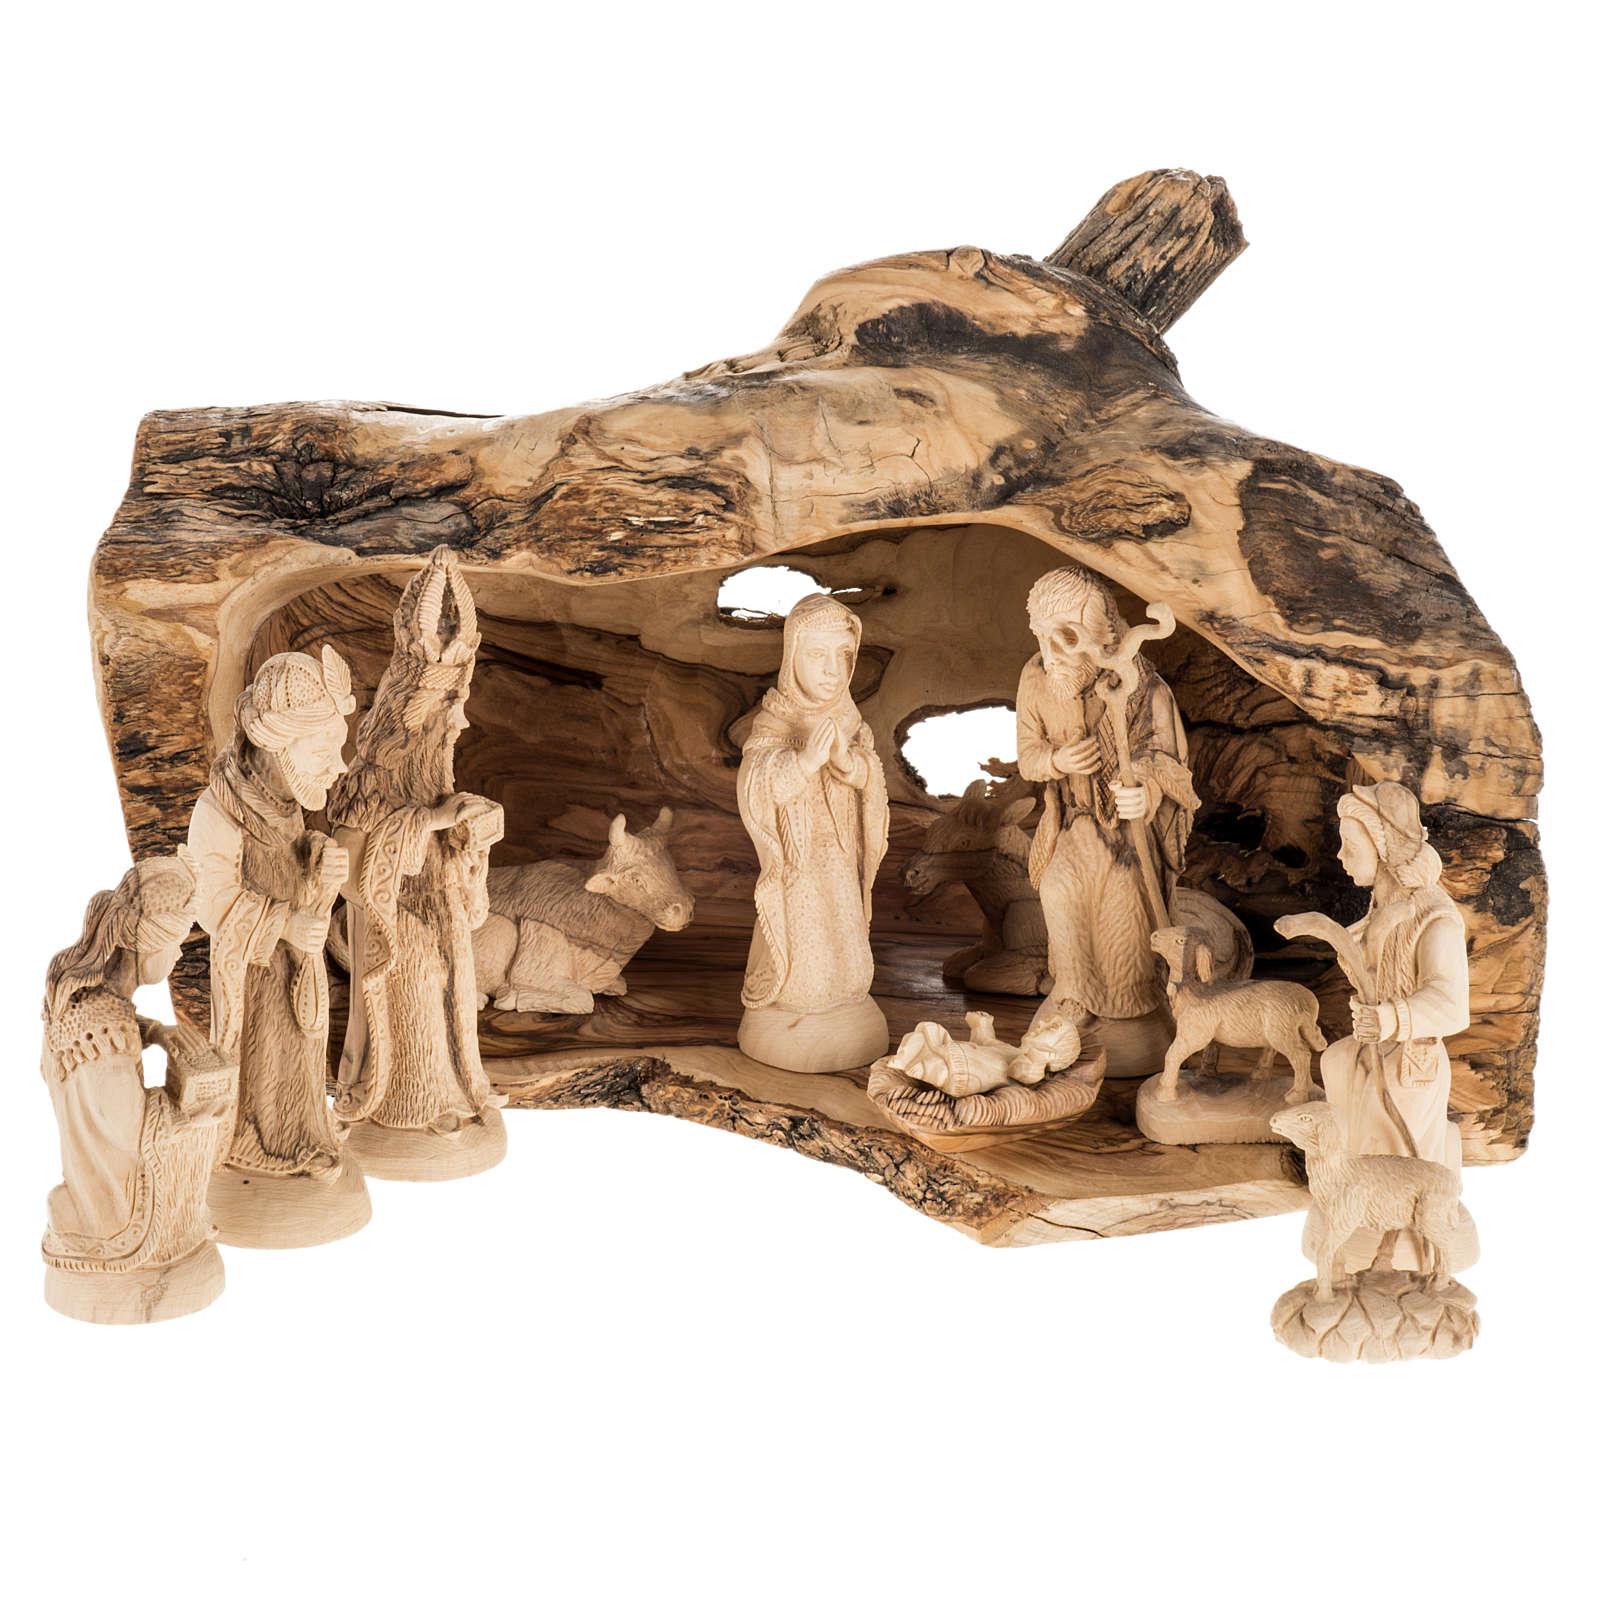 Presepe completo legno olivo Betlemme 14 cm con grotta 4